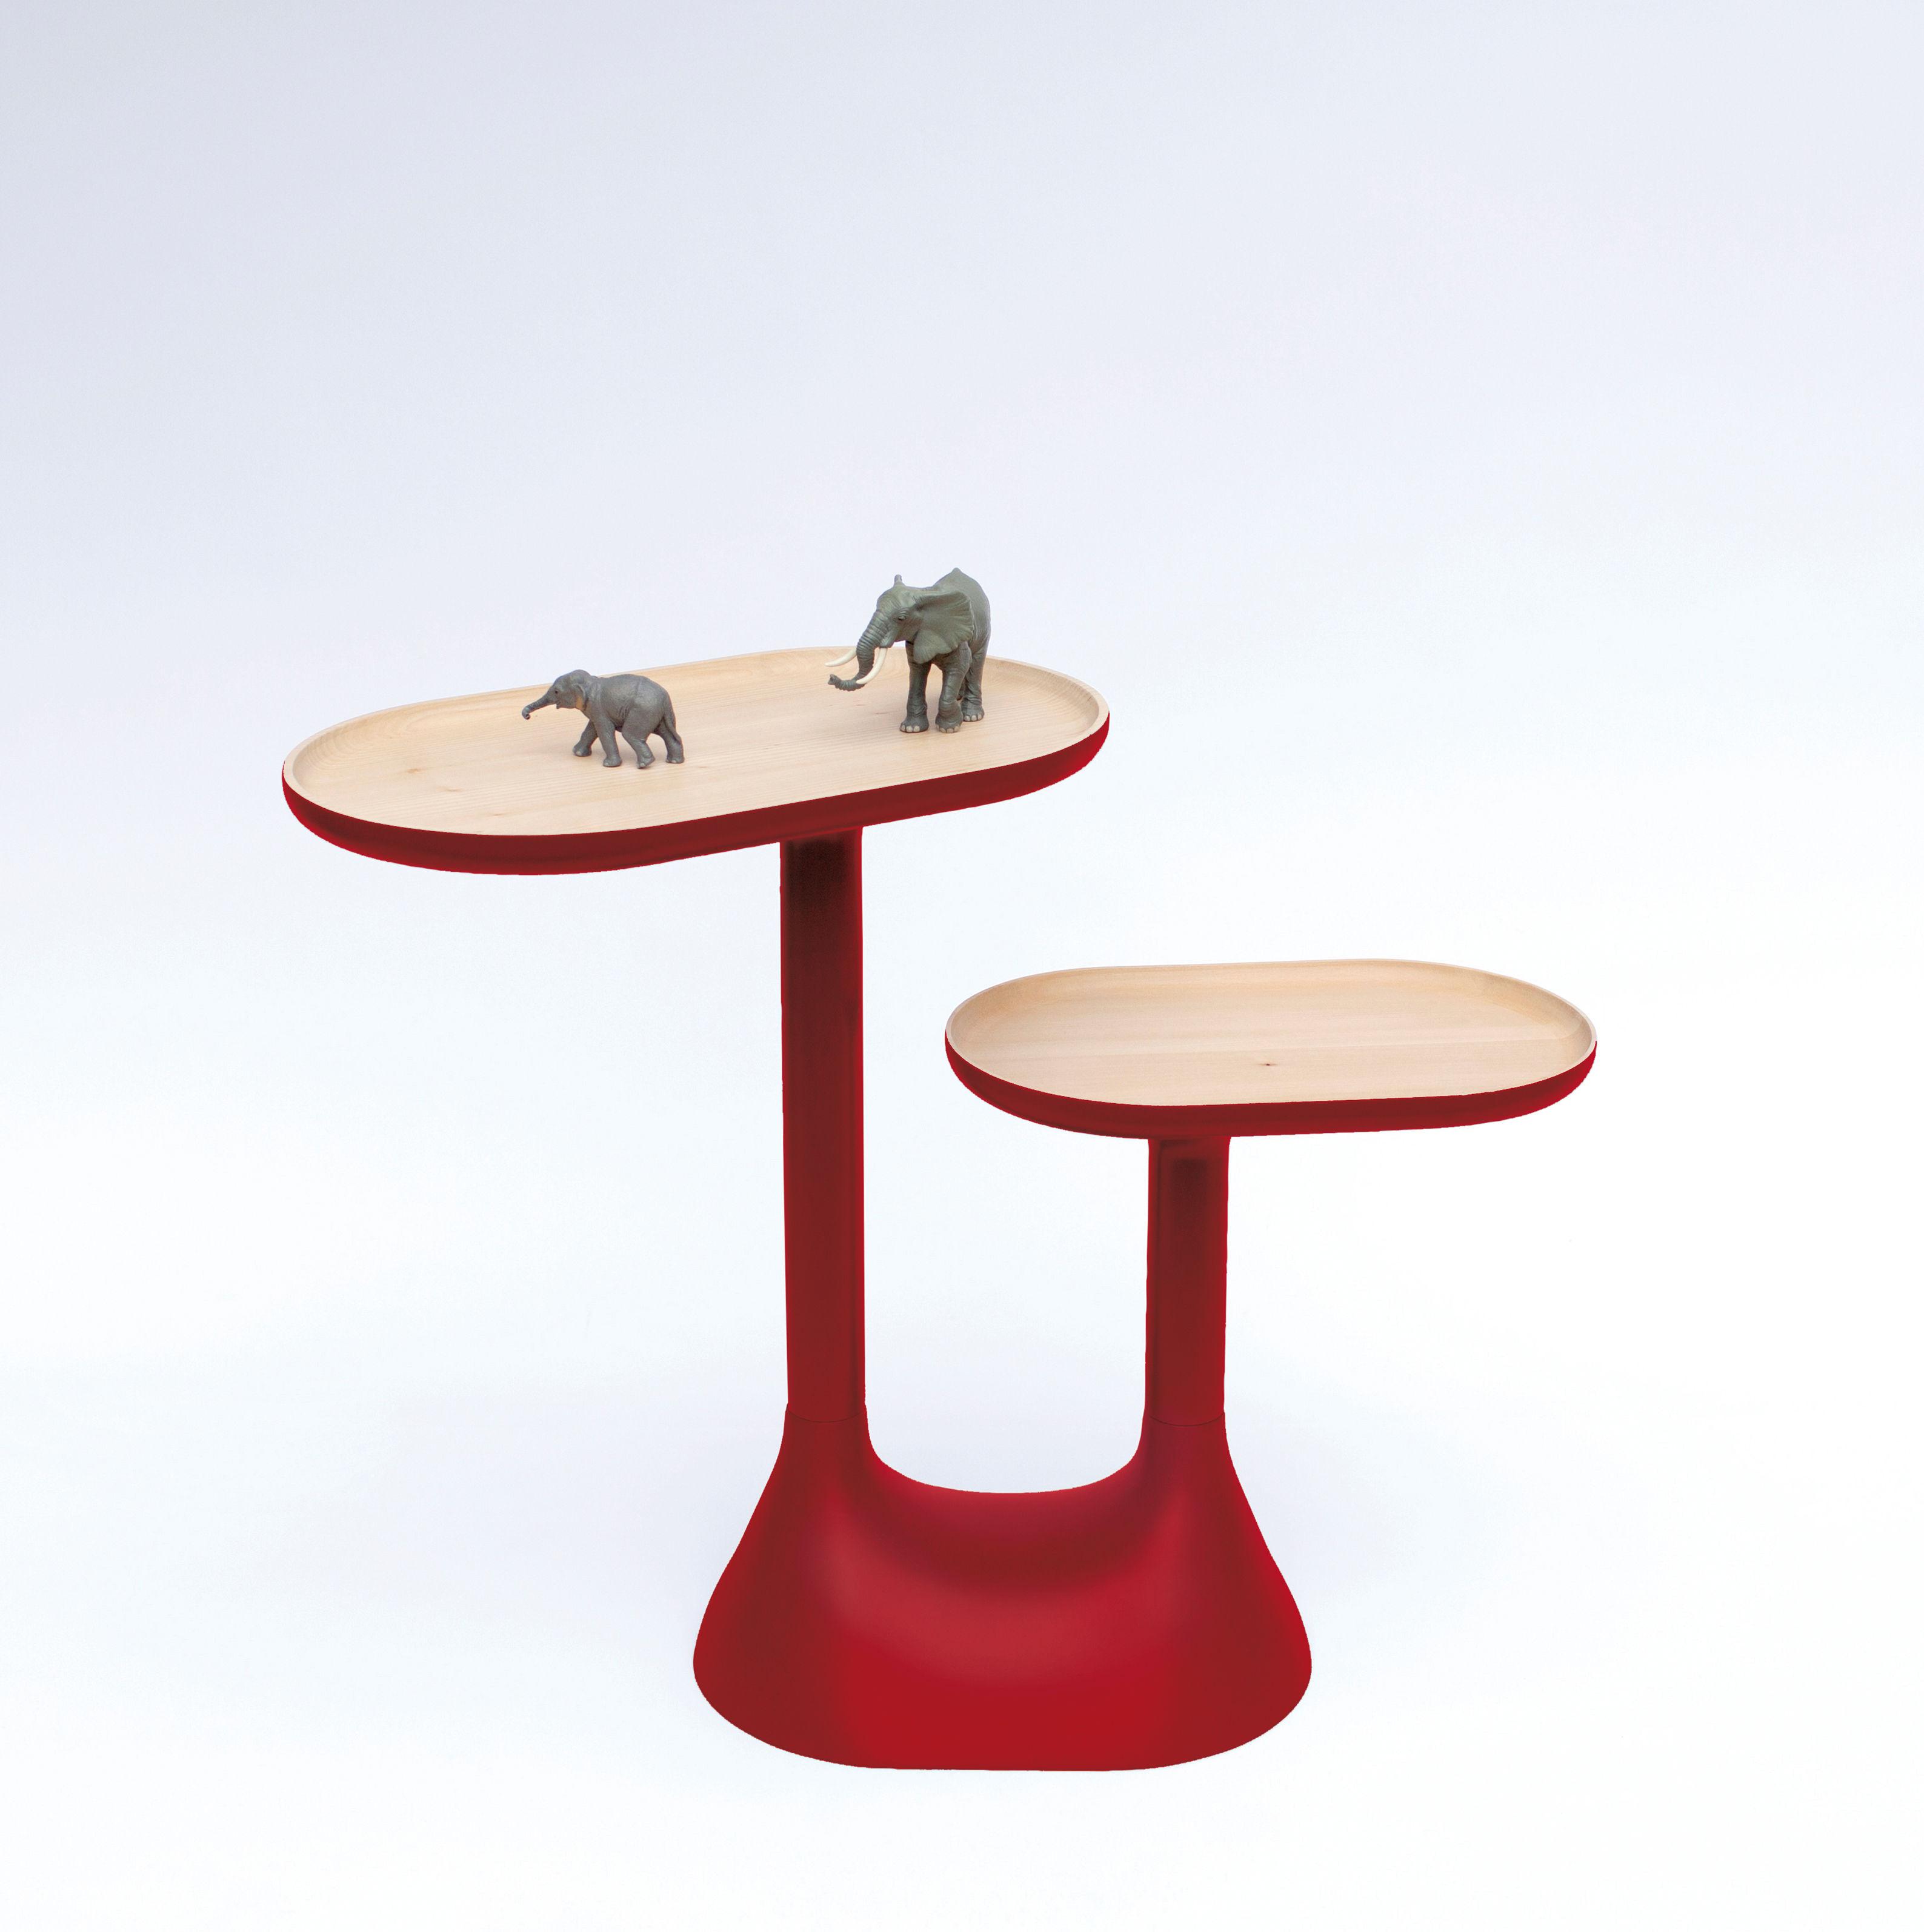 table basse baobab 2 plateaux pivotants rouge moustache. Black Bedroom Furniture Sets. Home Design Ideas